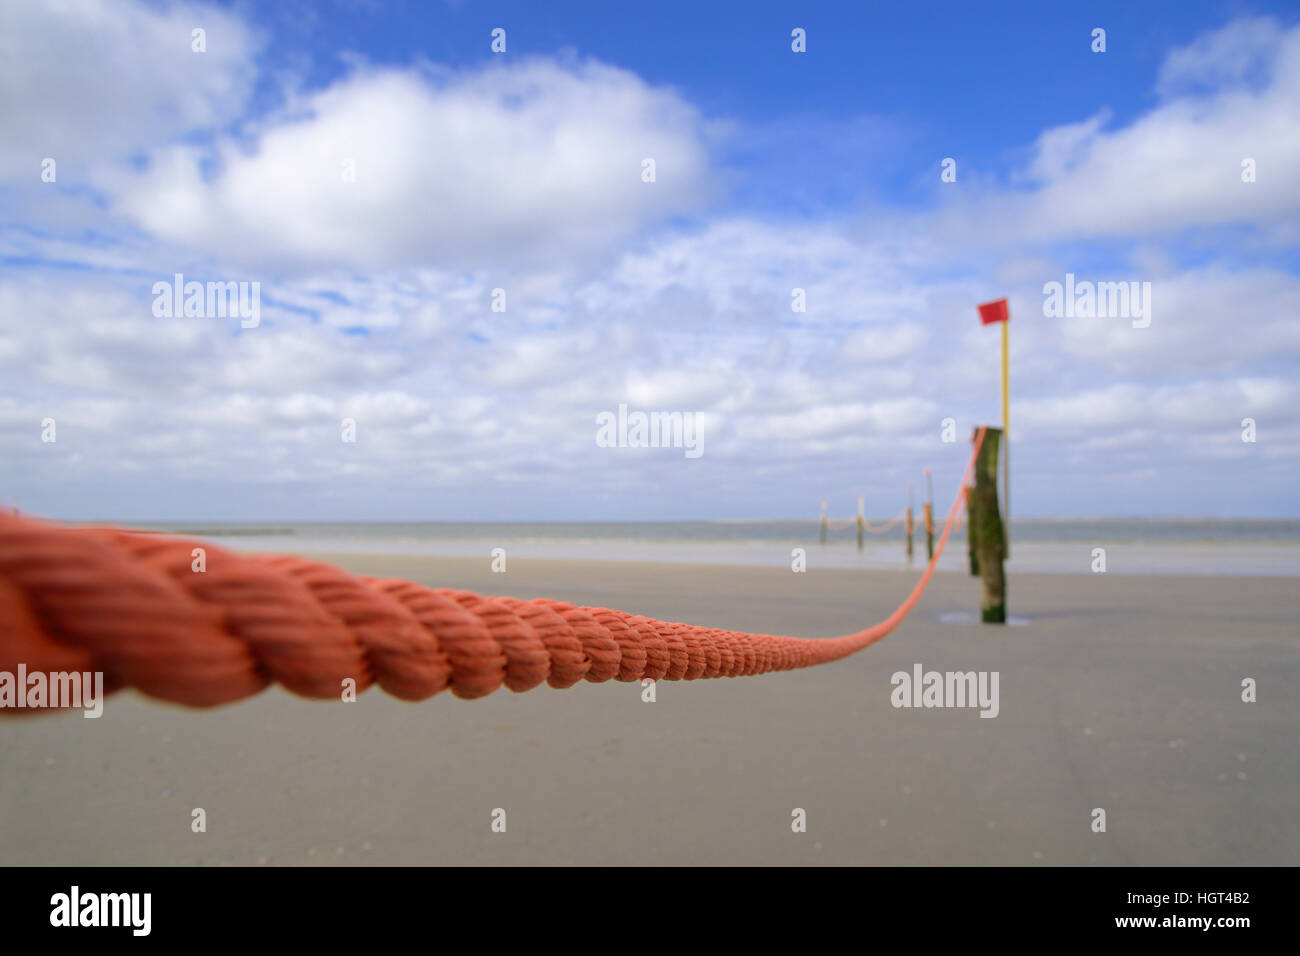 Orange barricade rope guarding bathing area, Norderney, East Frisian Islands, North Sea, Lower Saxony, Germany - Stock Image